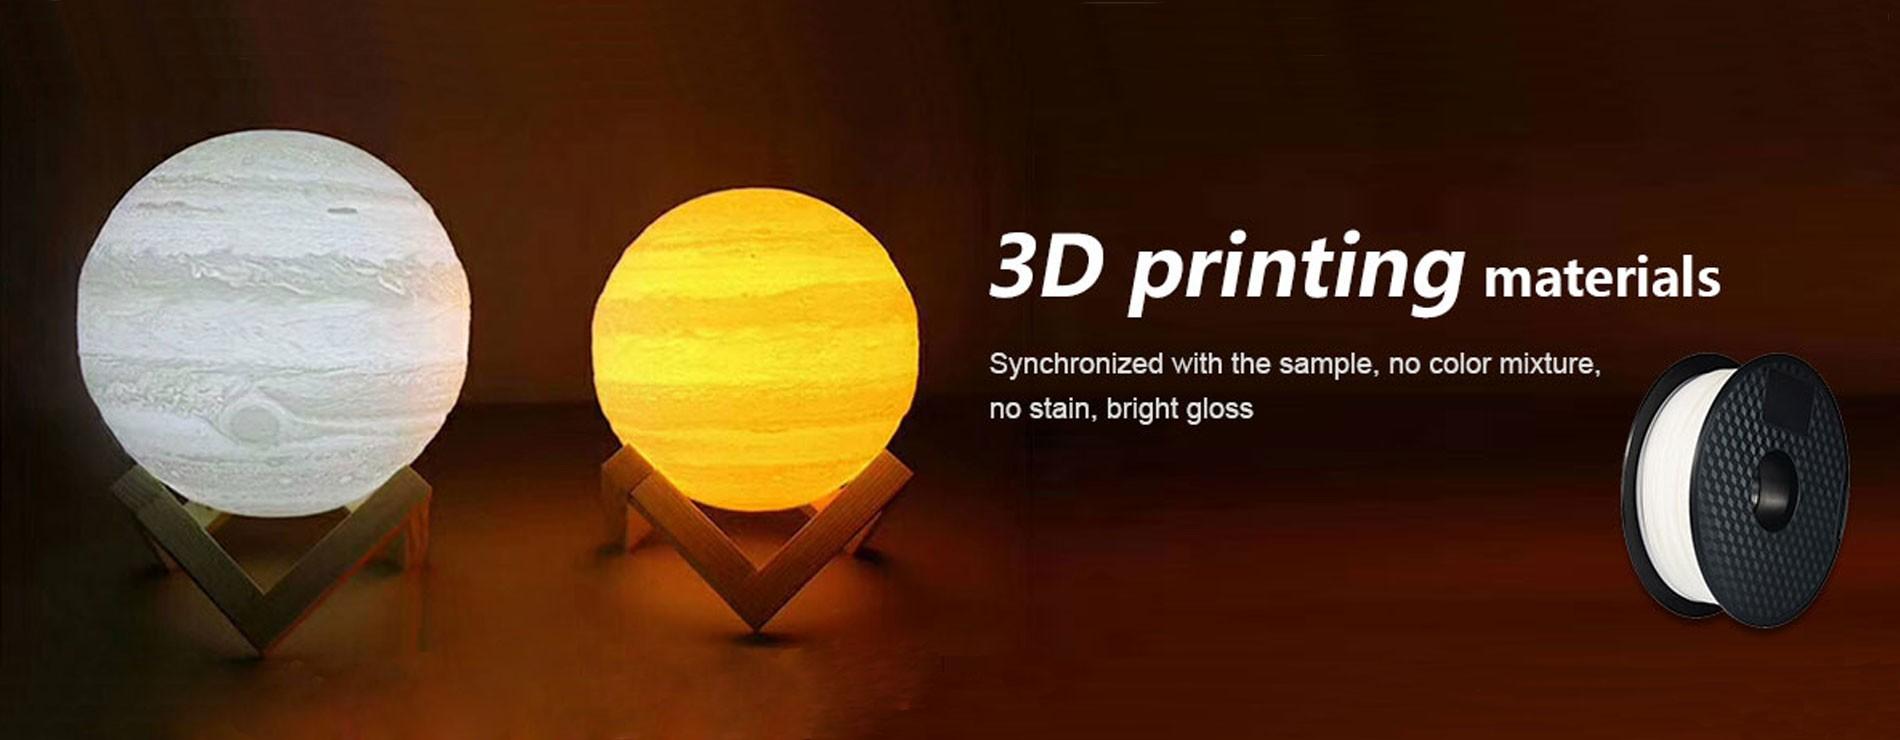 Nylon 3D Printing Materials